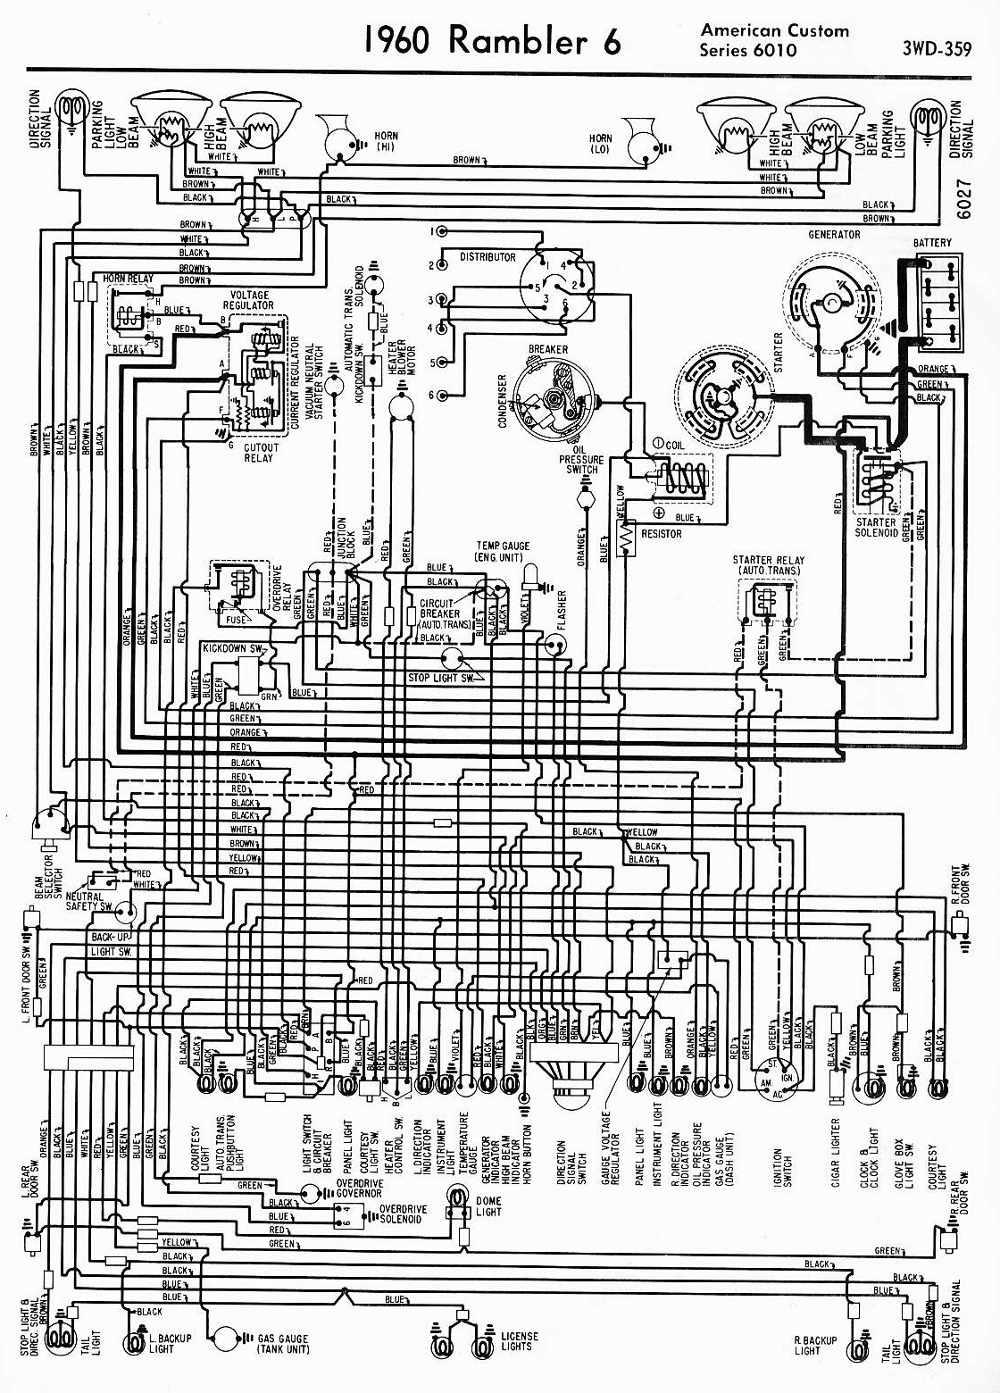 Amc Car Pdf Manual Wiring Diagram Fault Codes Dtc